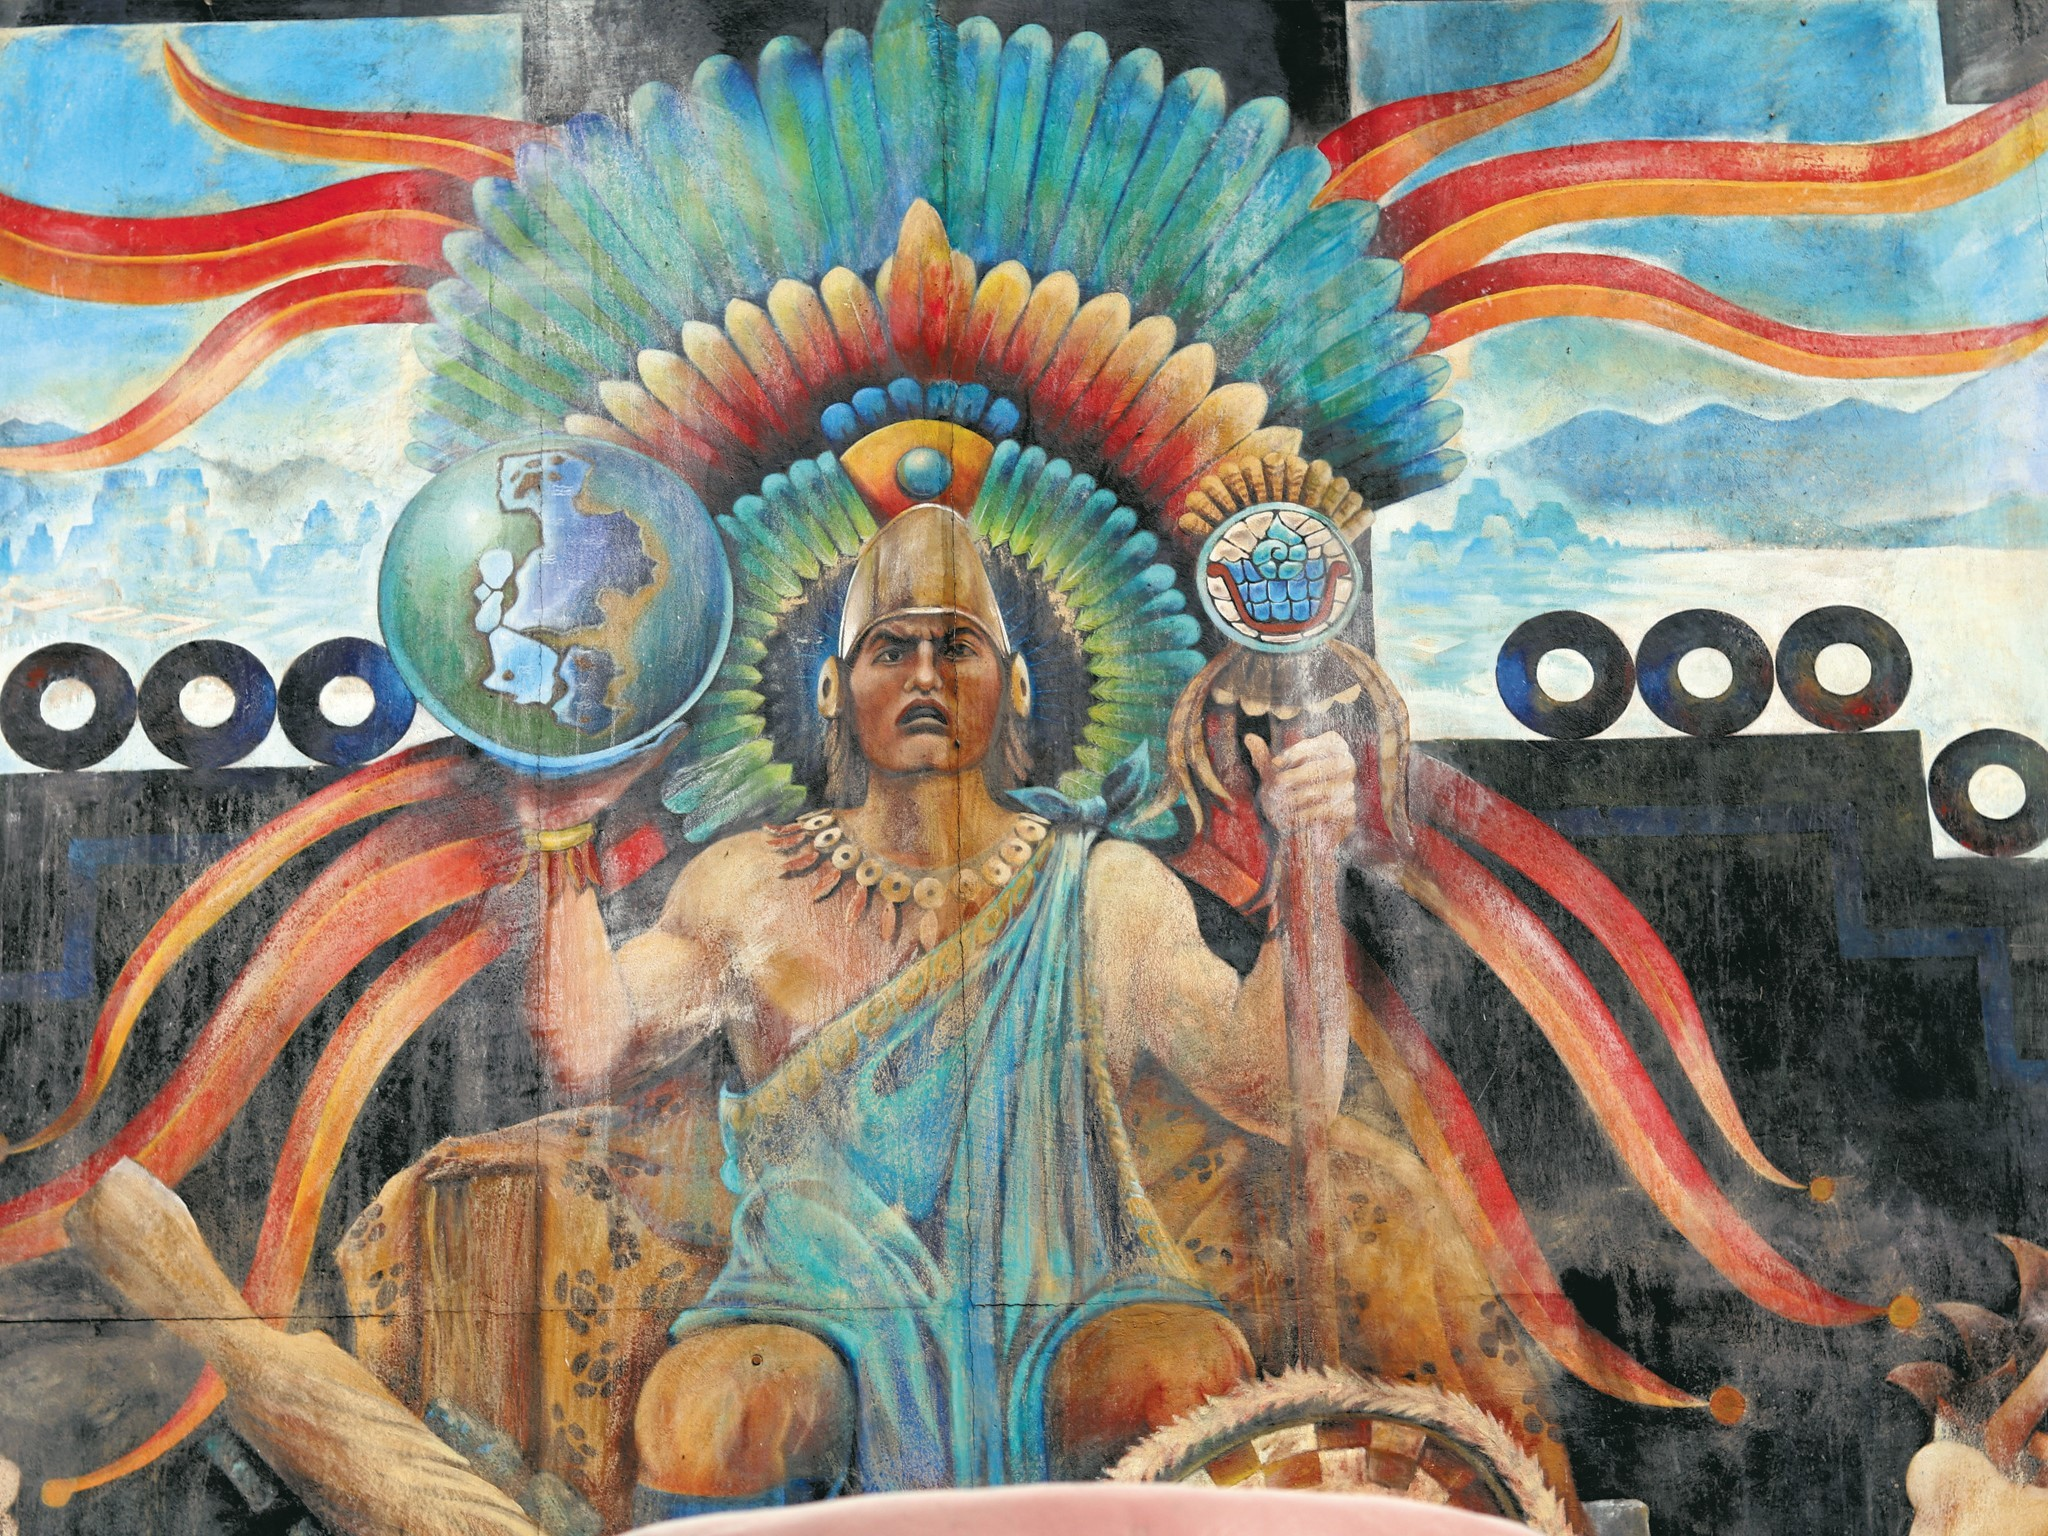 Mural de Cuitláhuac en Iztapalapa